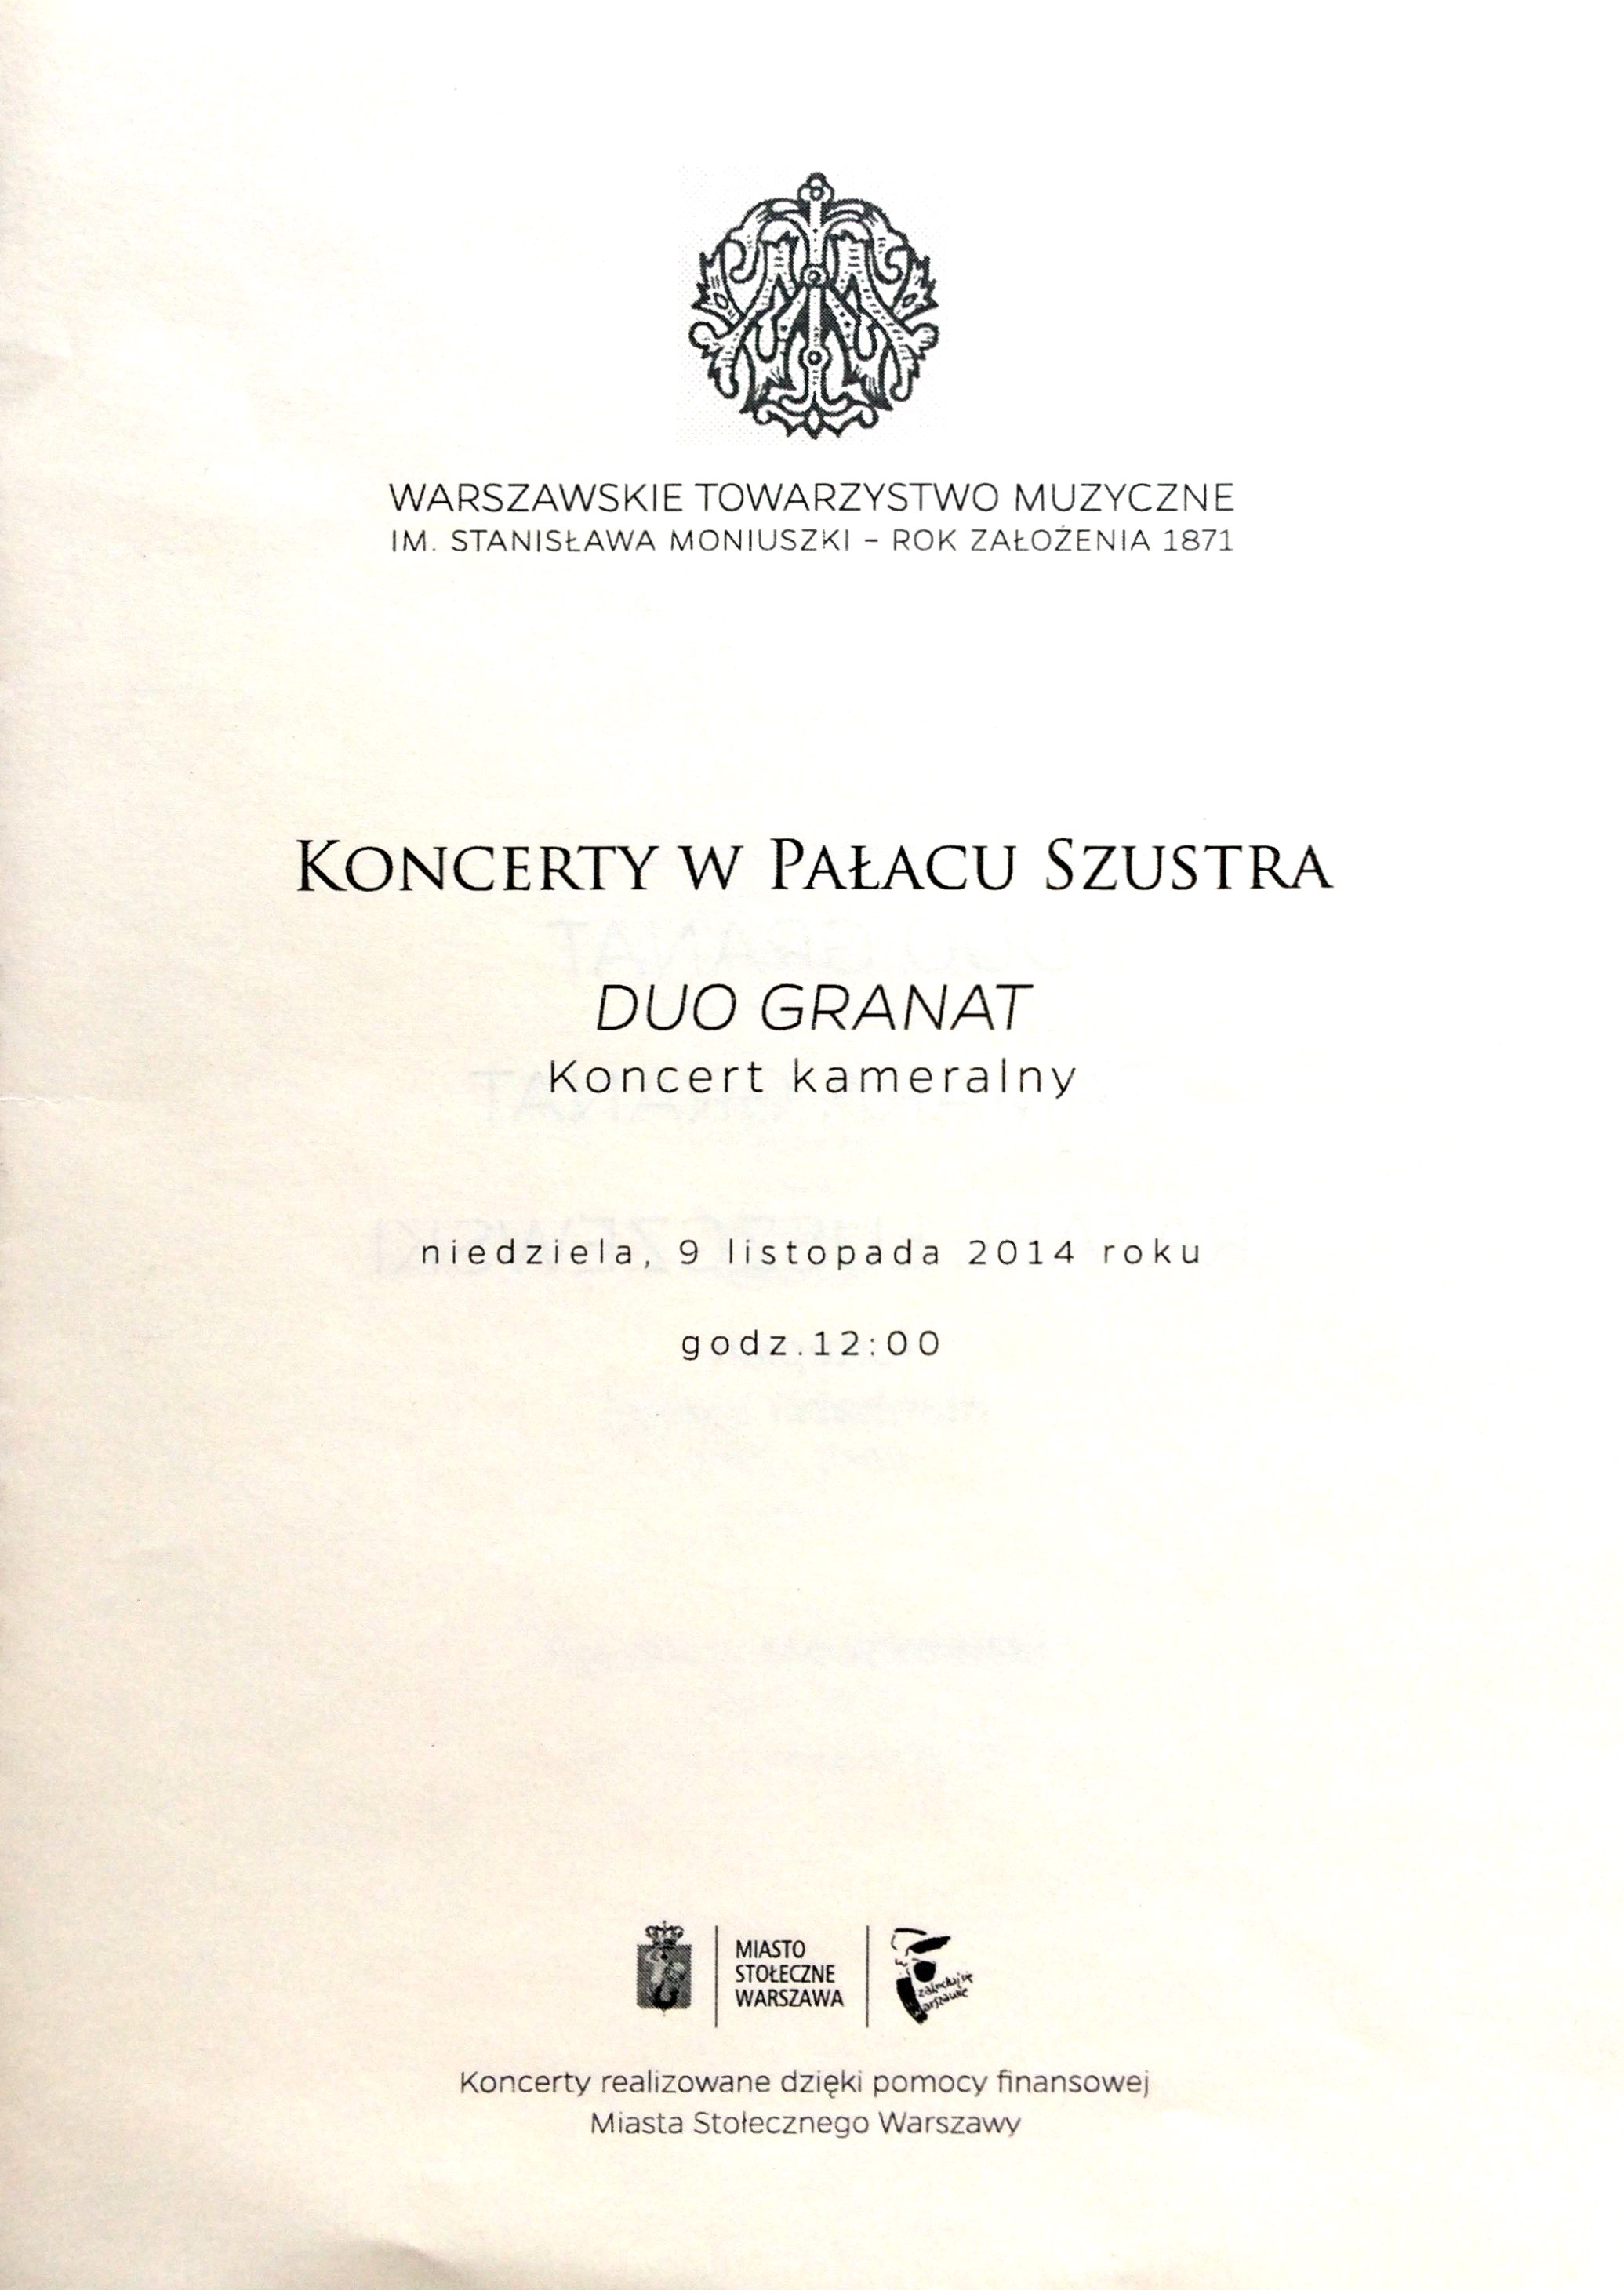 20141109 Warszawa Palac.jpg